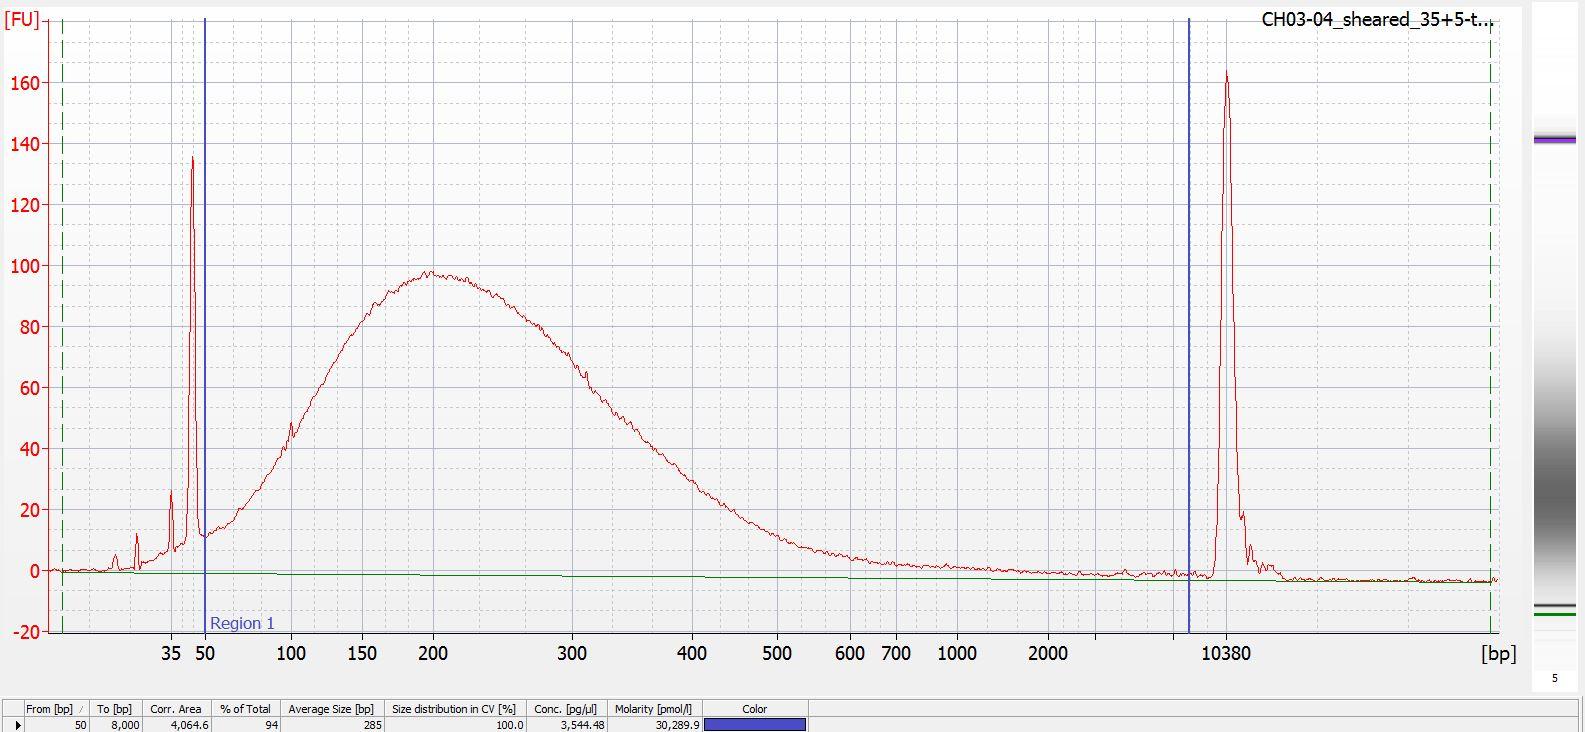 Sheared CH03-04 Bioanalyzer electropherogram